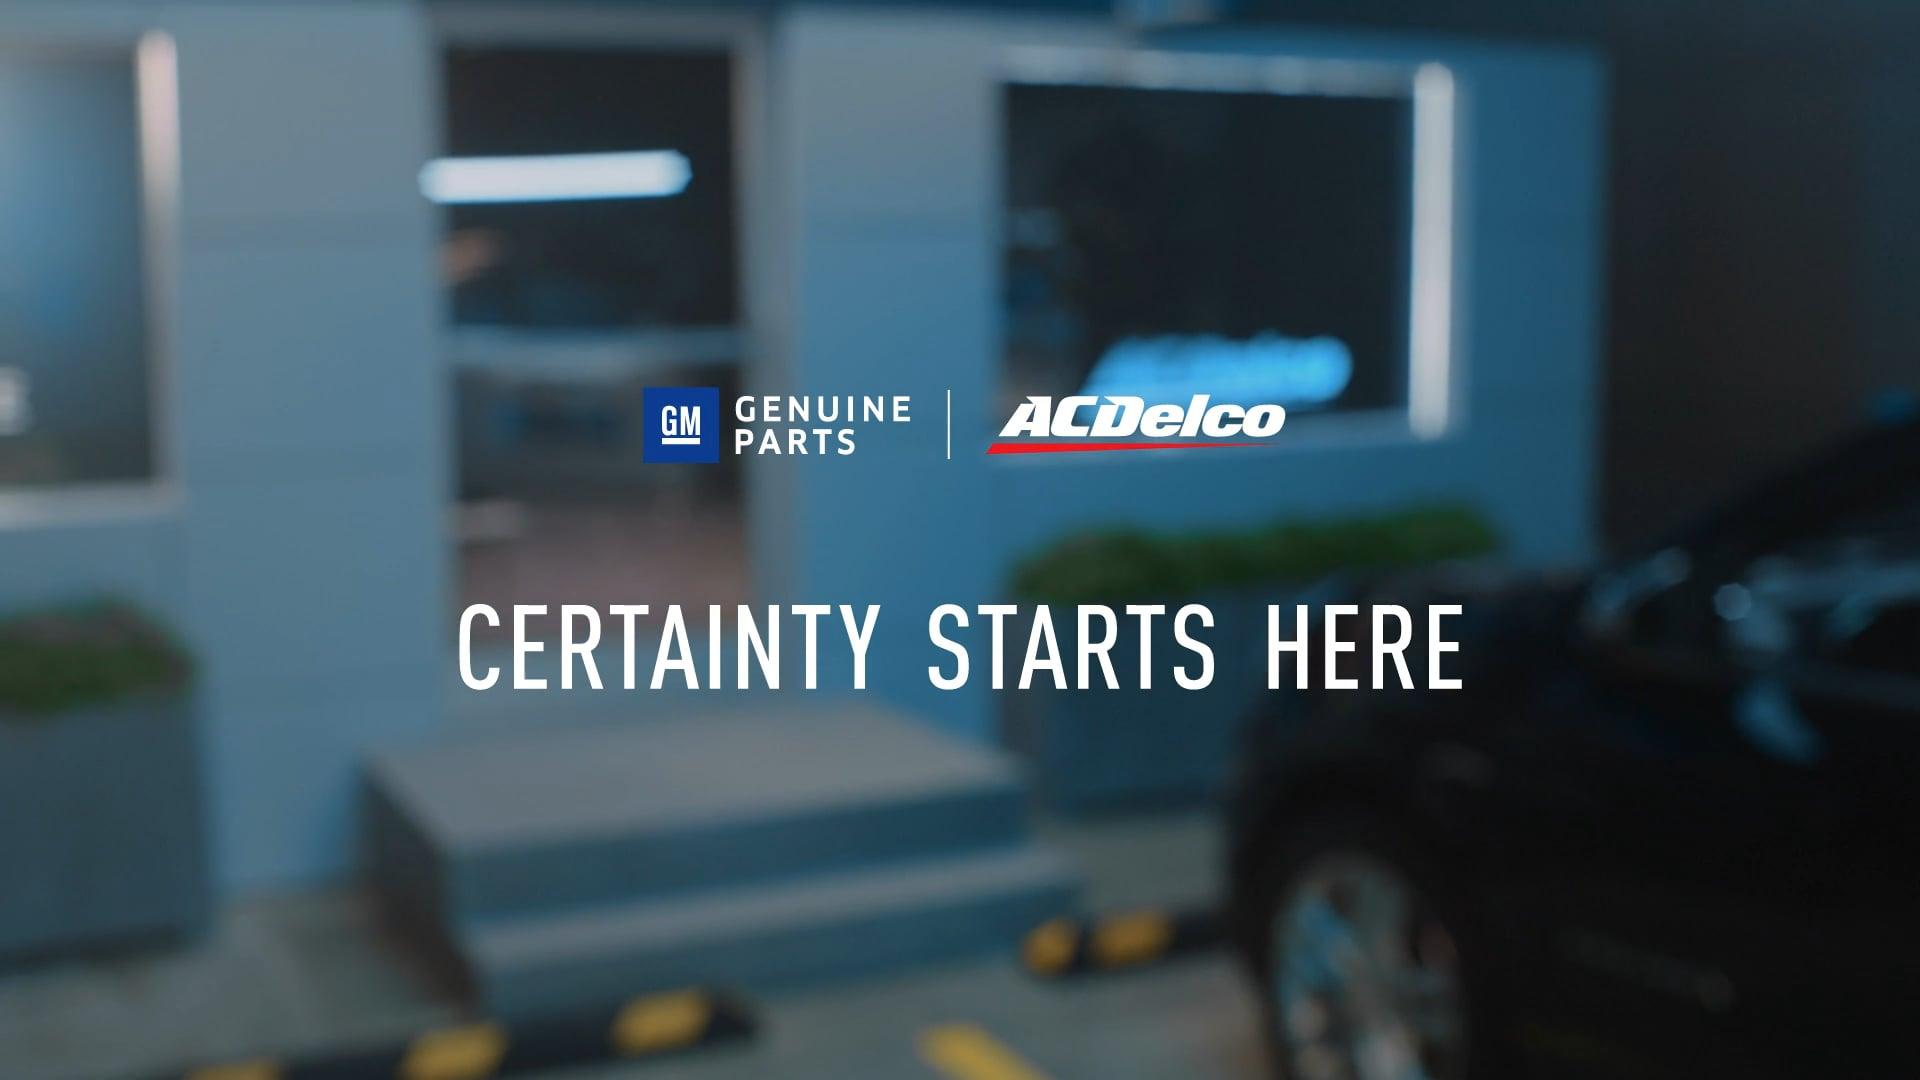 AC Delco GM Parts | Leo Burnett